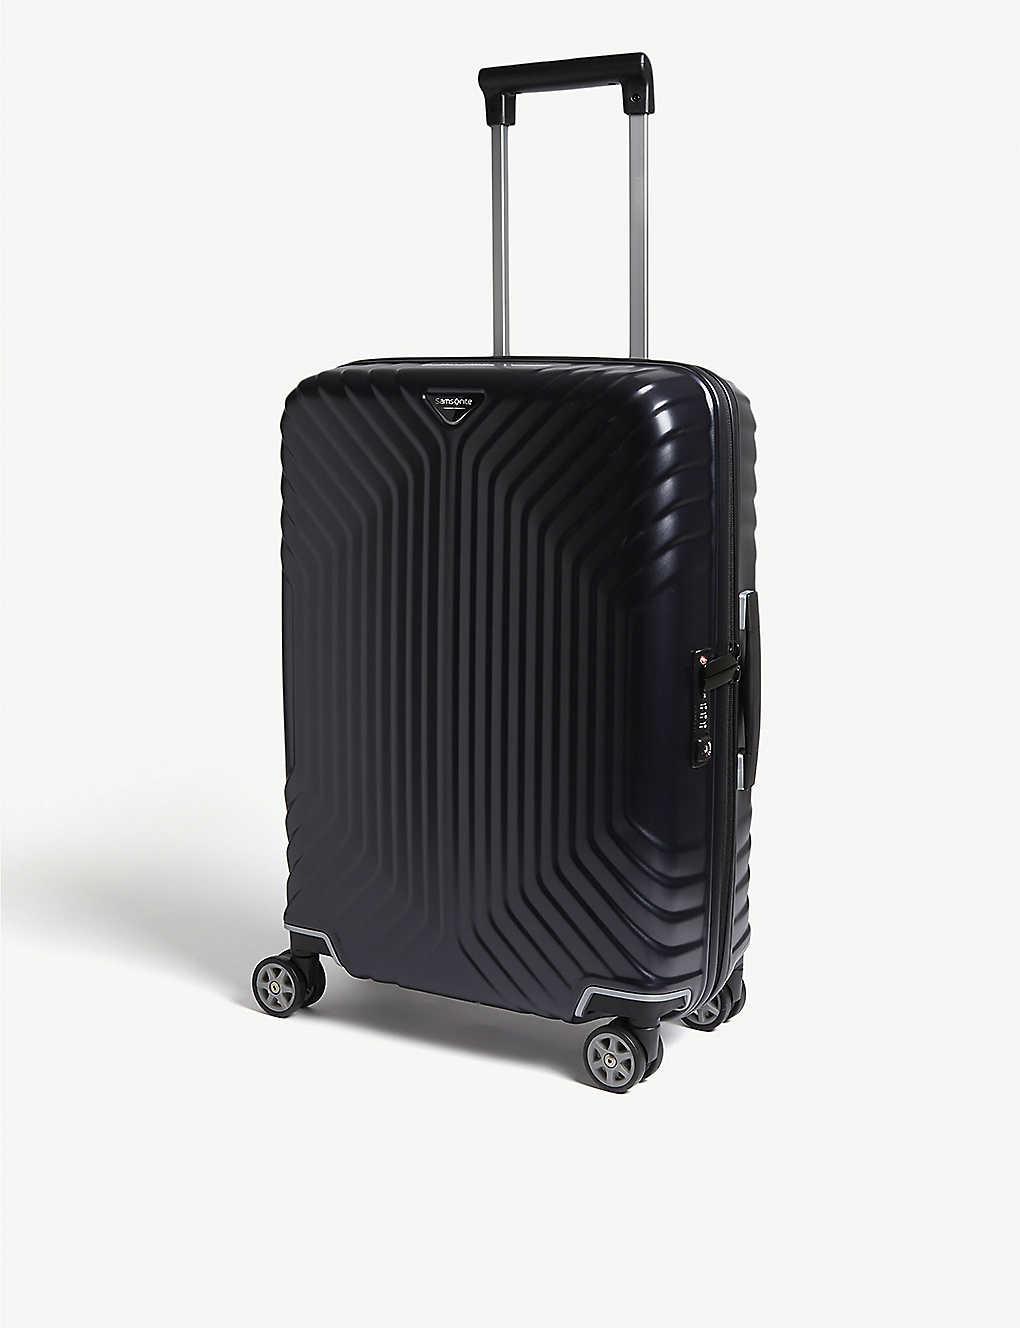 SPINNER SAMSONITE MIXMESH | Luggage | Travel | Women